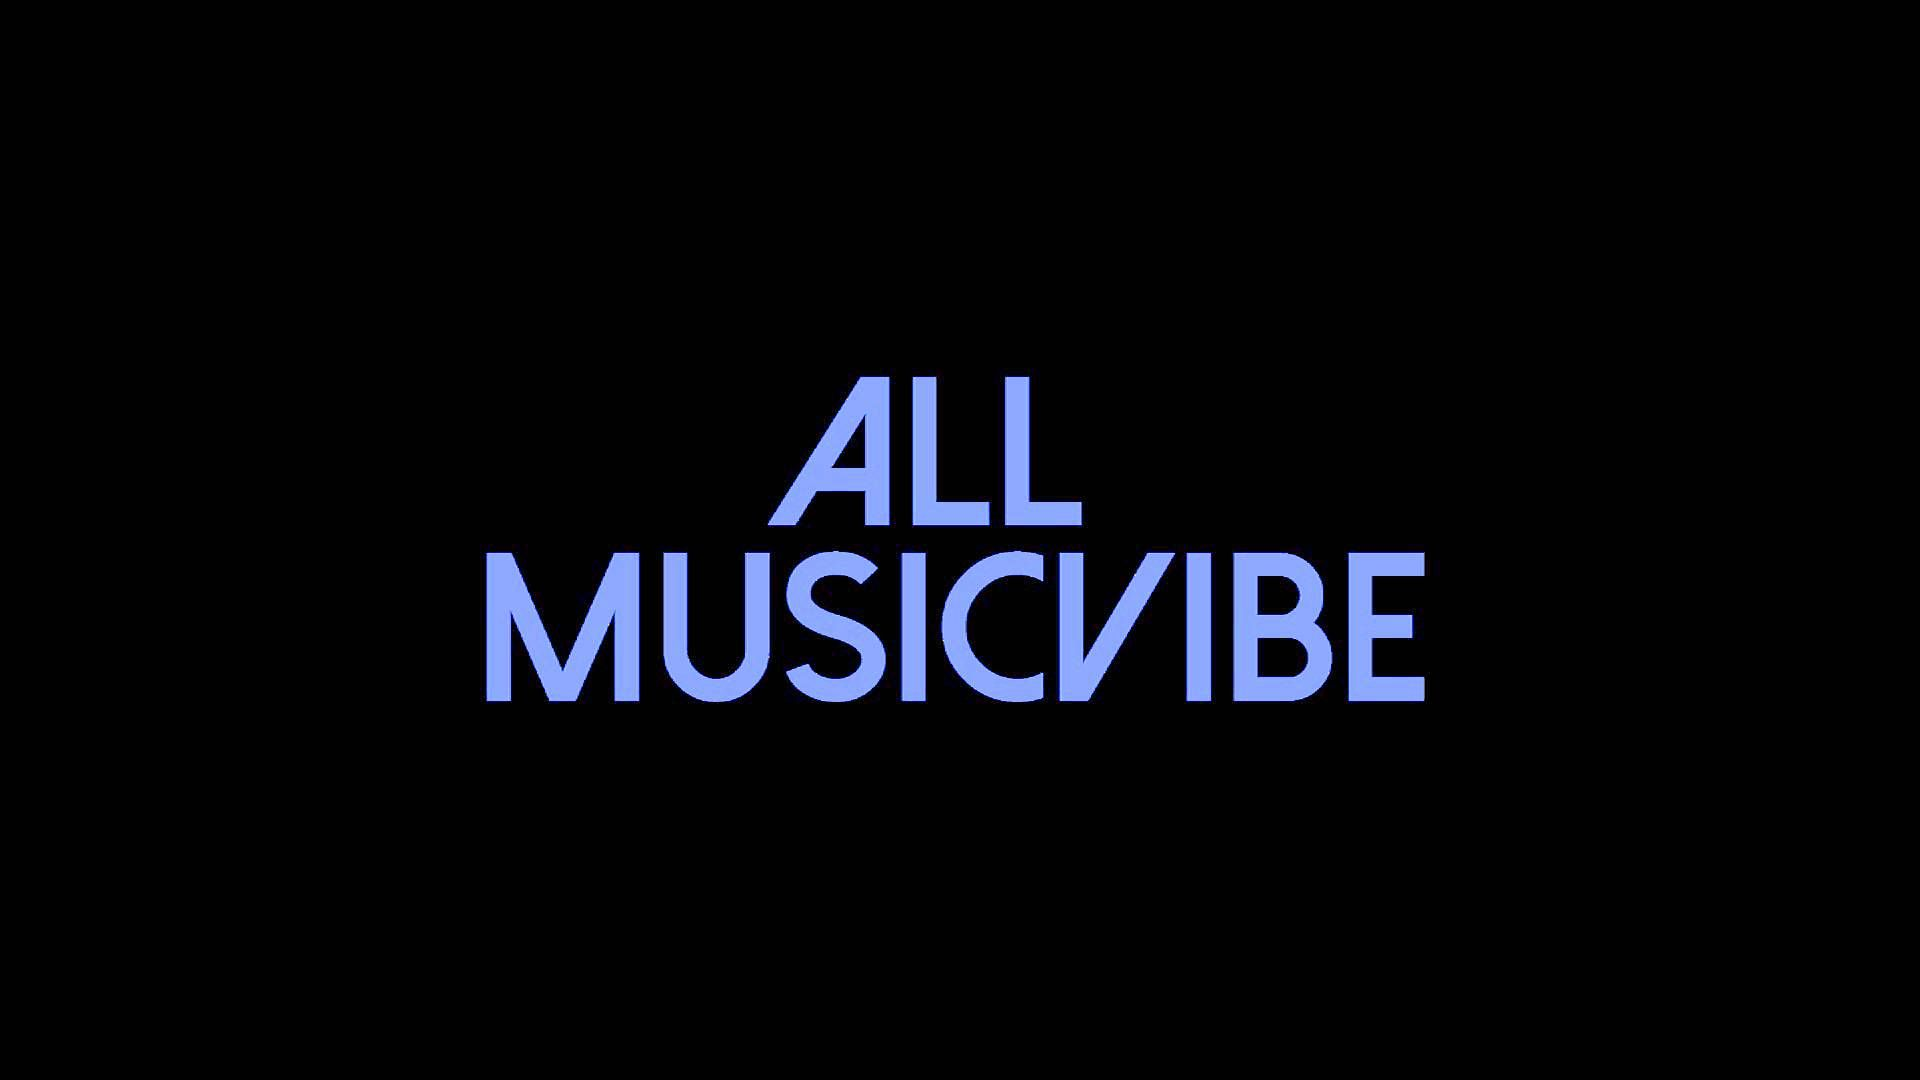 [DeepHouse] Luca Trezza - What is Love? (feat. Bastian Winderl)  #DeepHouse #AllMusicVibe